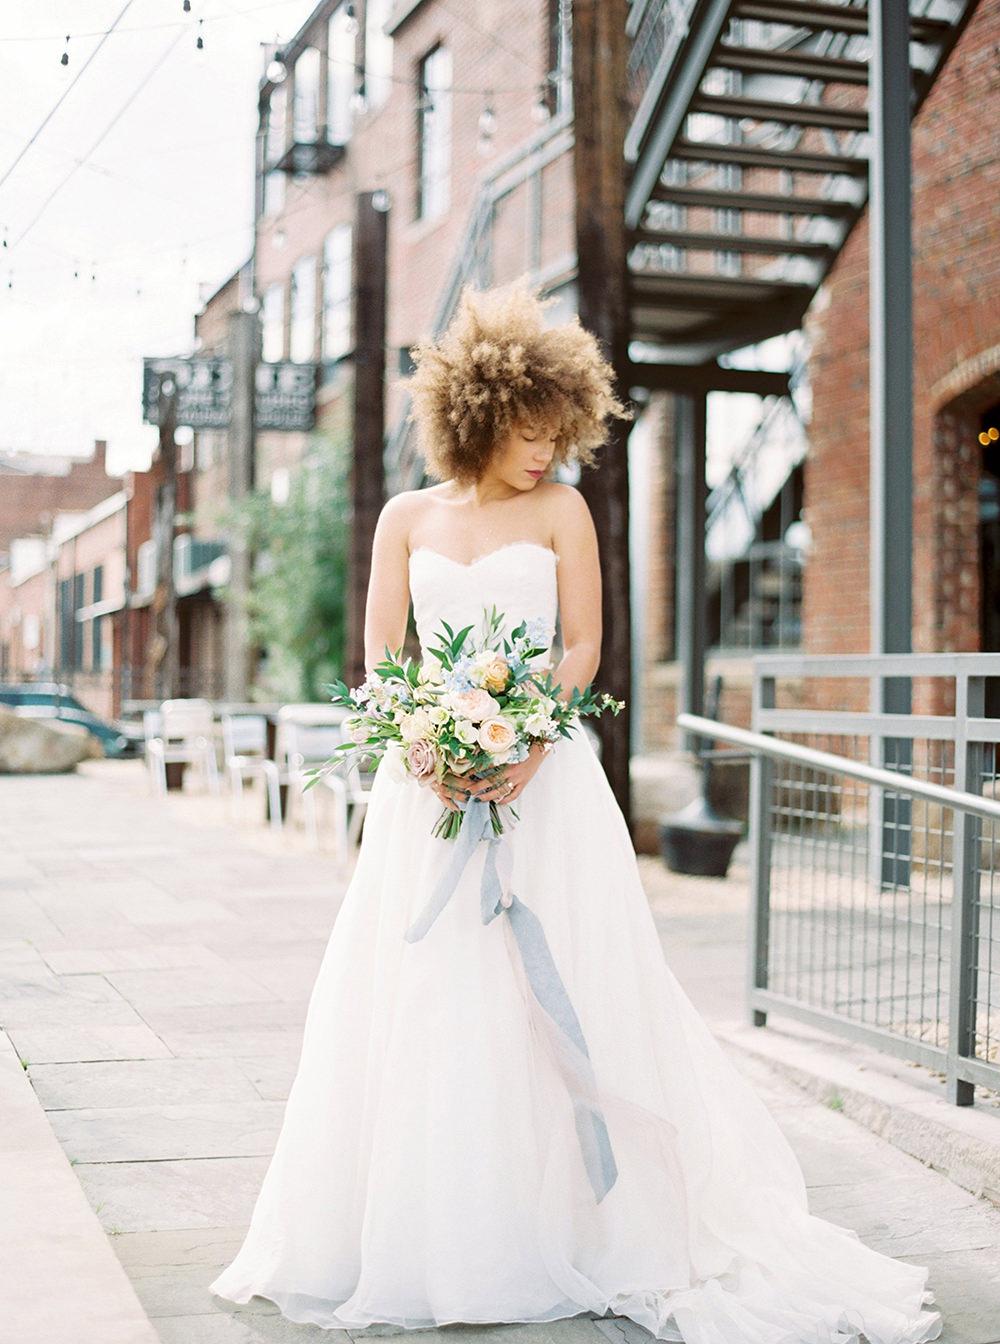 wedding photography - photo by Photos by Heart http://ruffledblog.com/downtown-birmingham-spring-wedding-inspiration